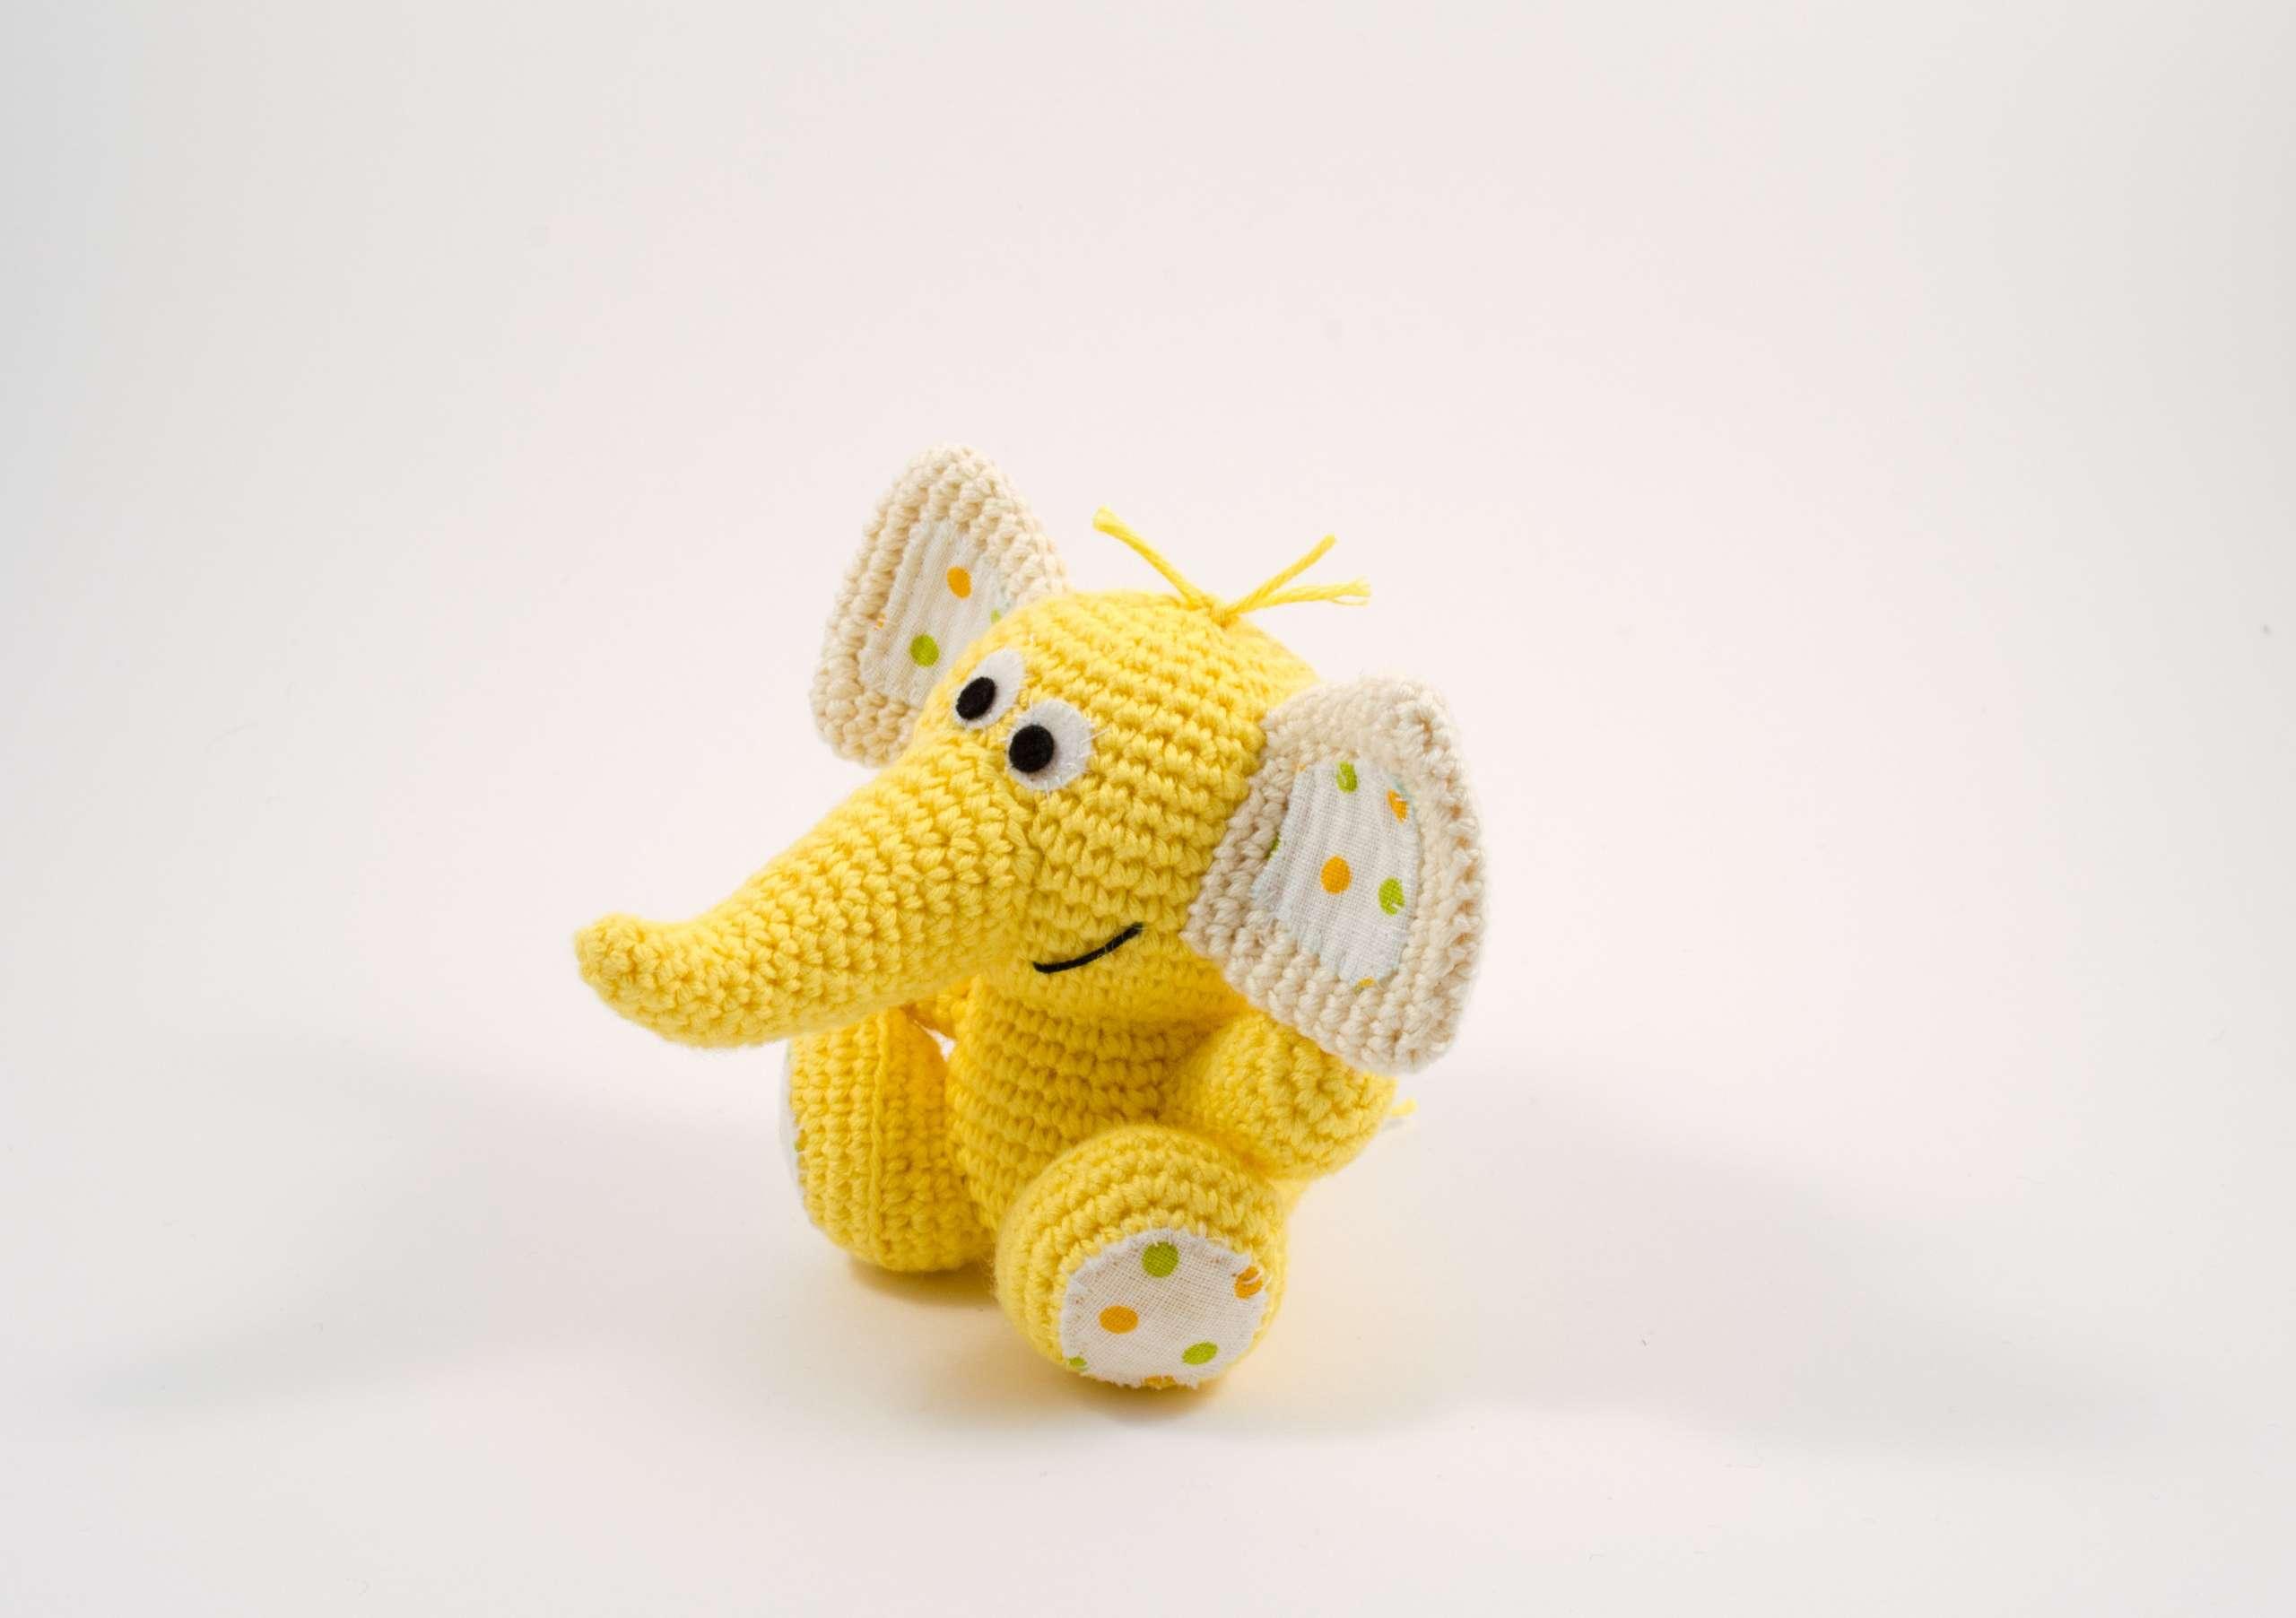 amigurumi baby elephant side view